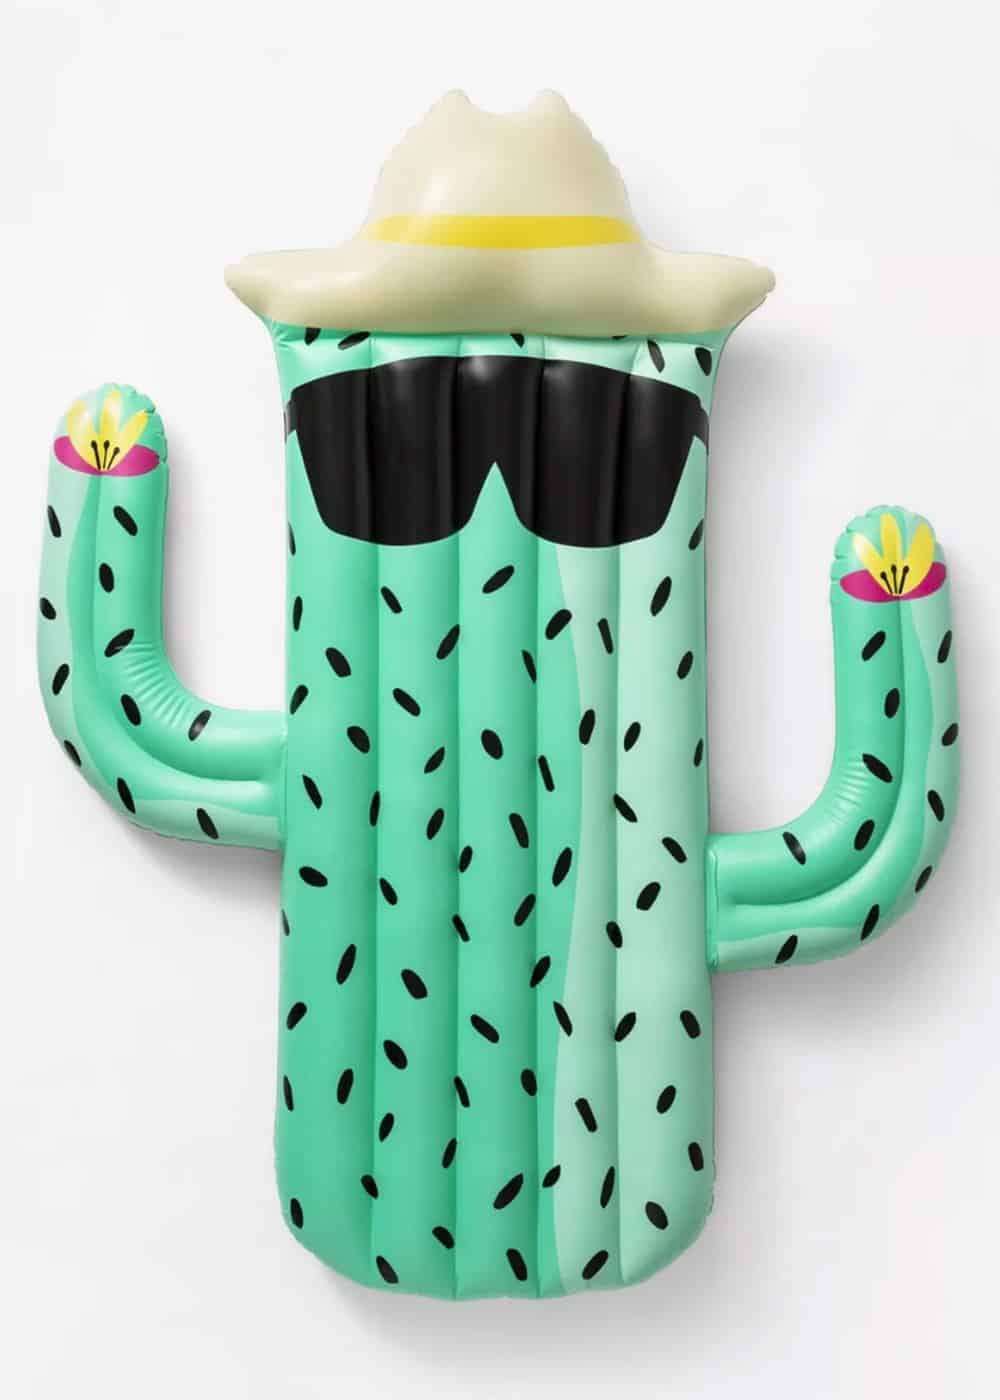 sunsquad cactus pool float target cowgirl magazine